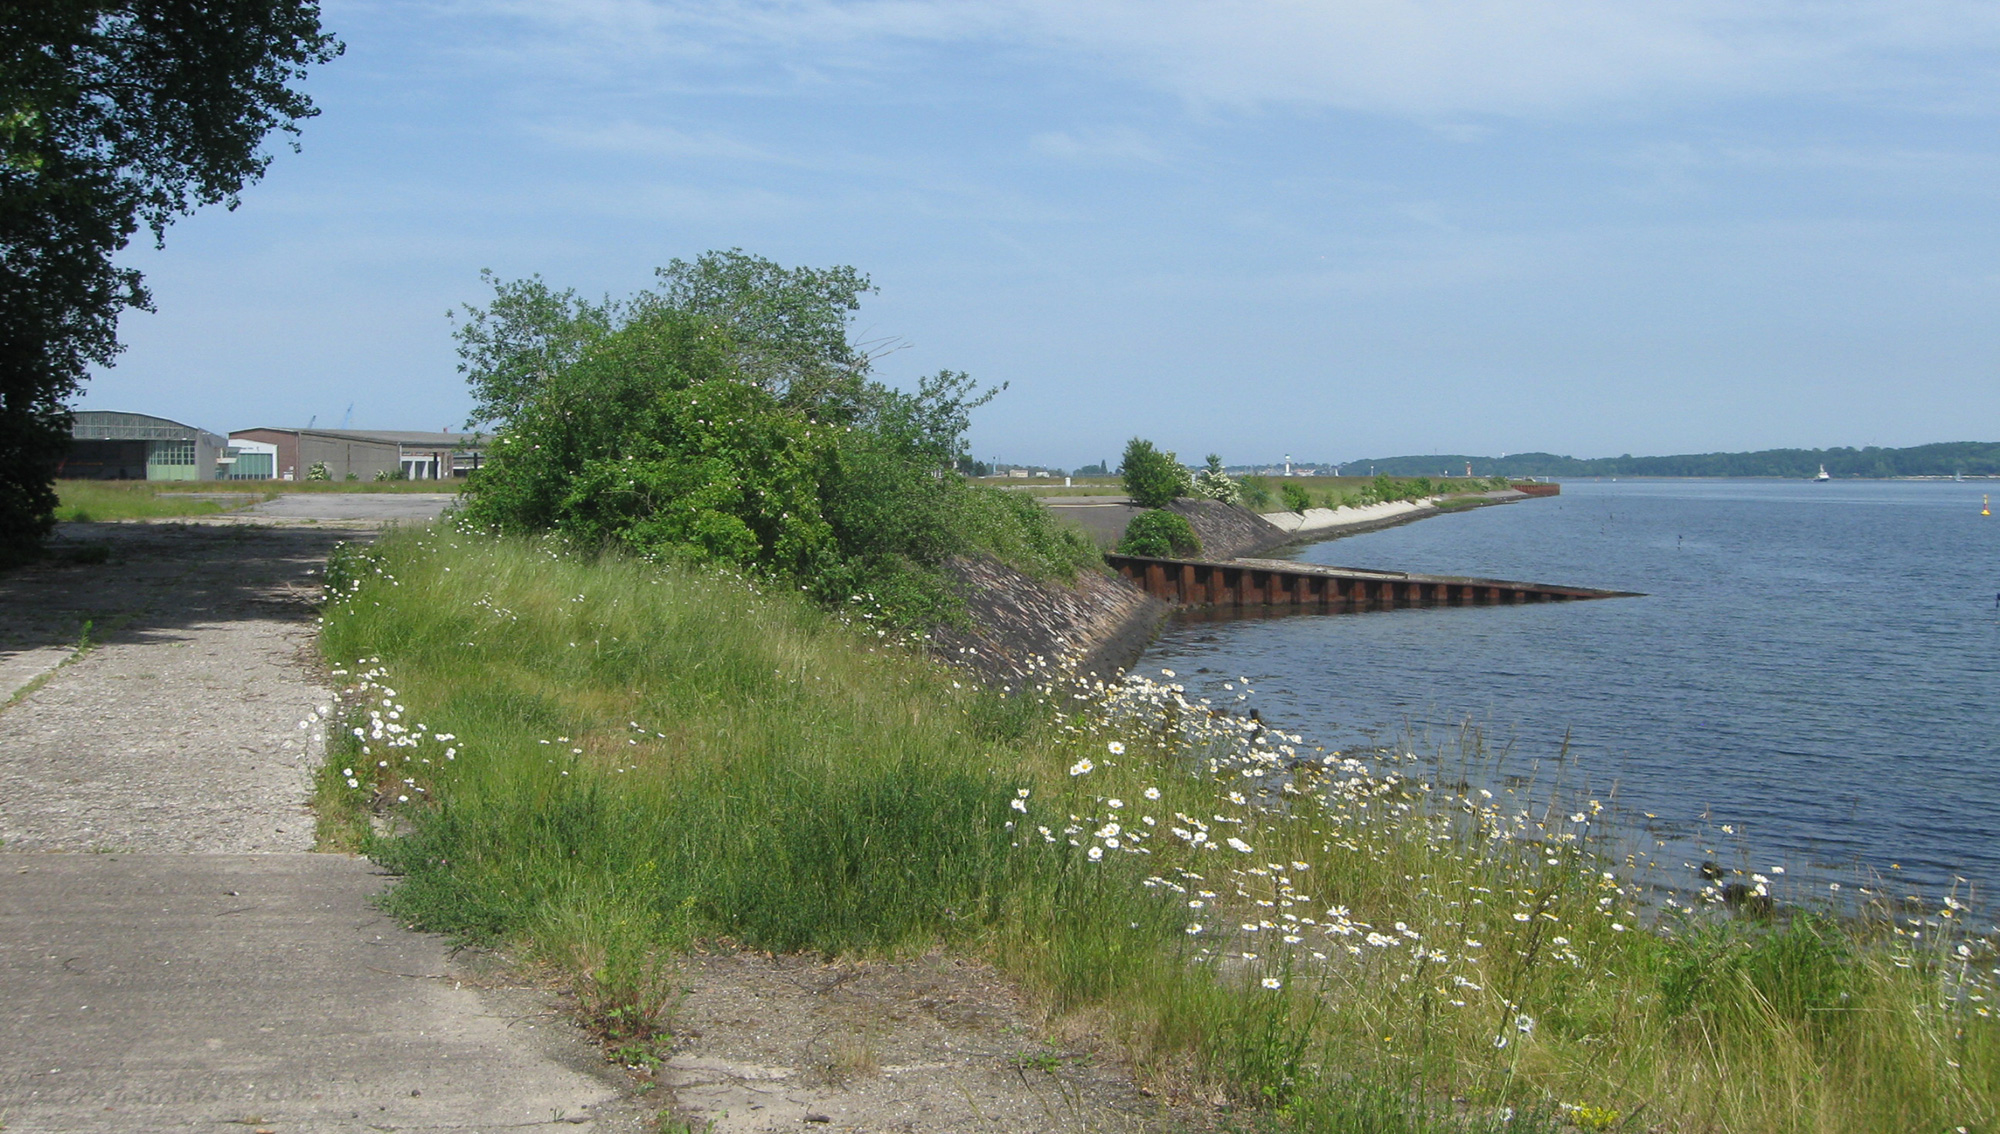 Rmp stephan lenzen landschaftsarchitekten machbarkeitsstudien - Rmp landschaftsarchitekten ...